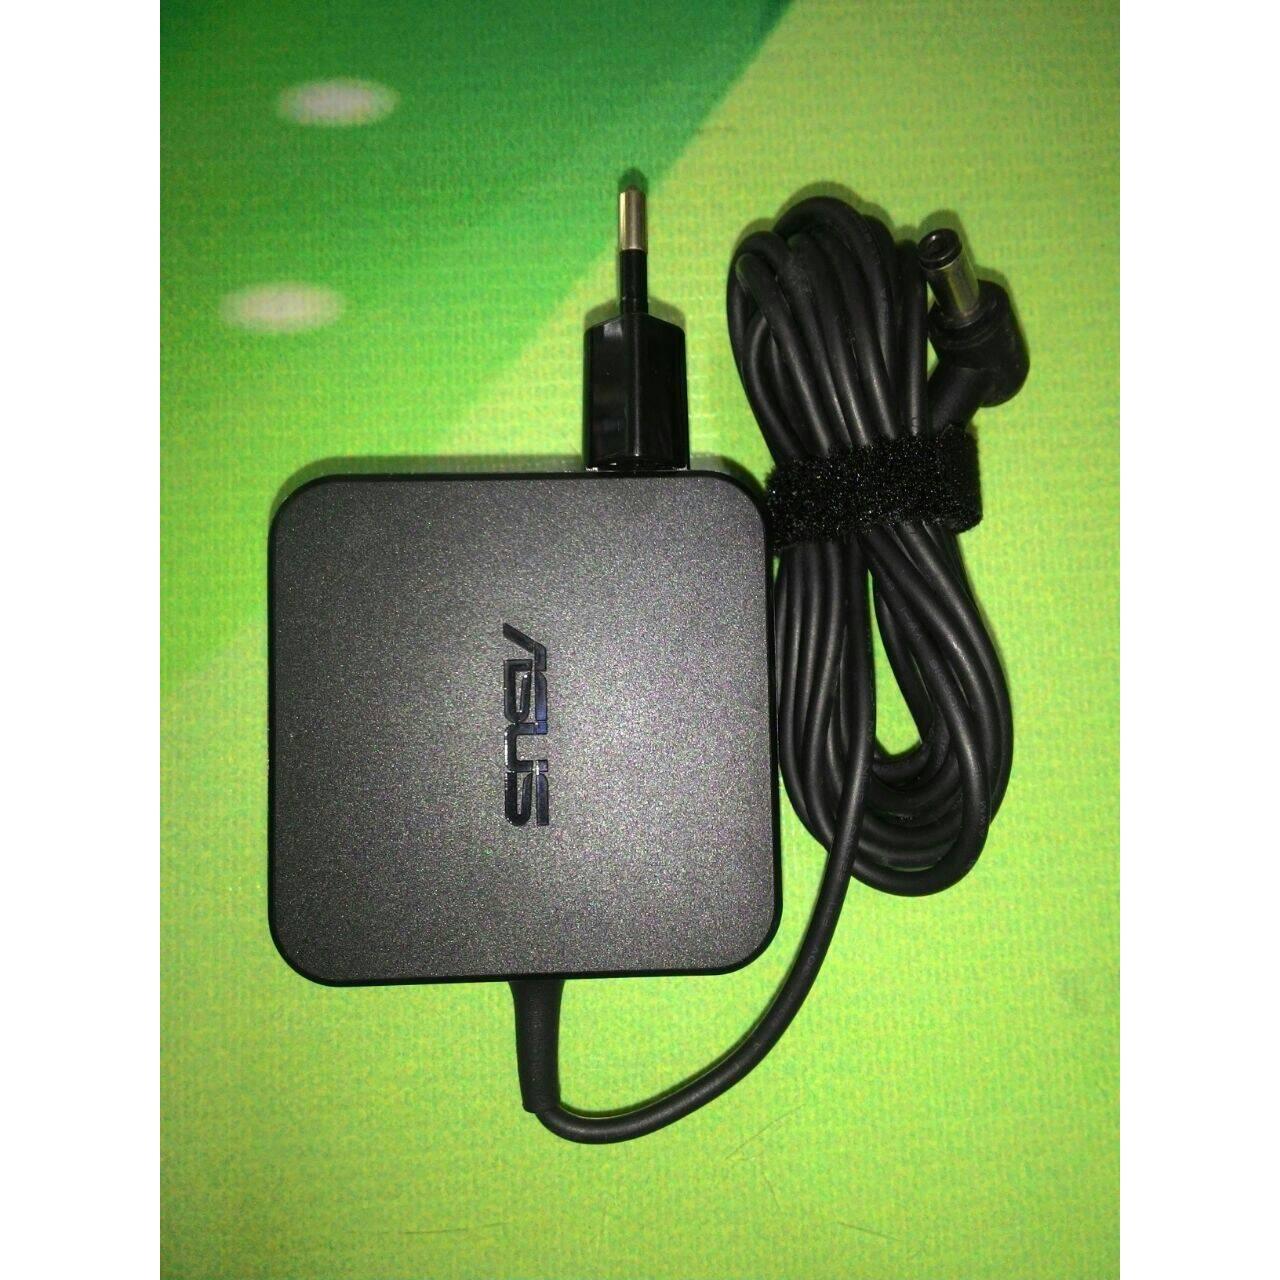 ASUS Ori Adaptor Charger Notebook Laptop ZenBook UX31E RY02V UX21E KX007V  19v 2.37A  (5.5*2.5) Petak Kotak